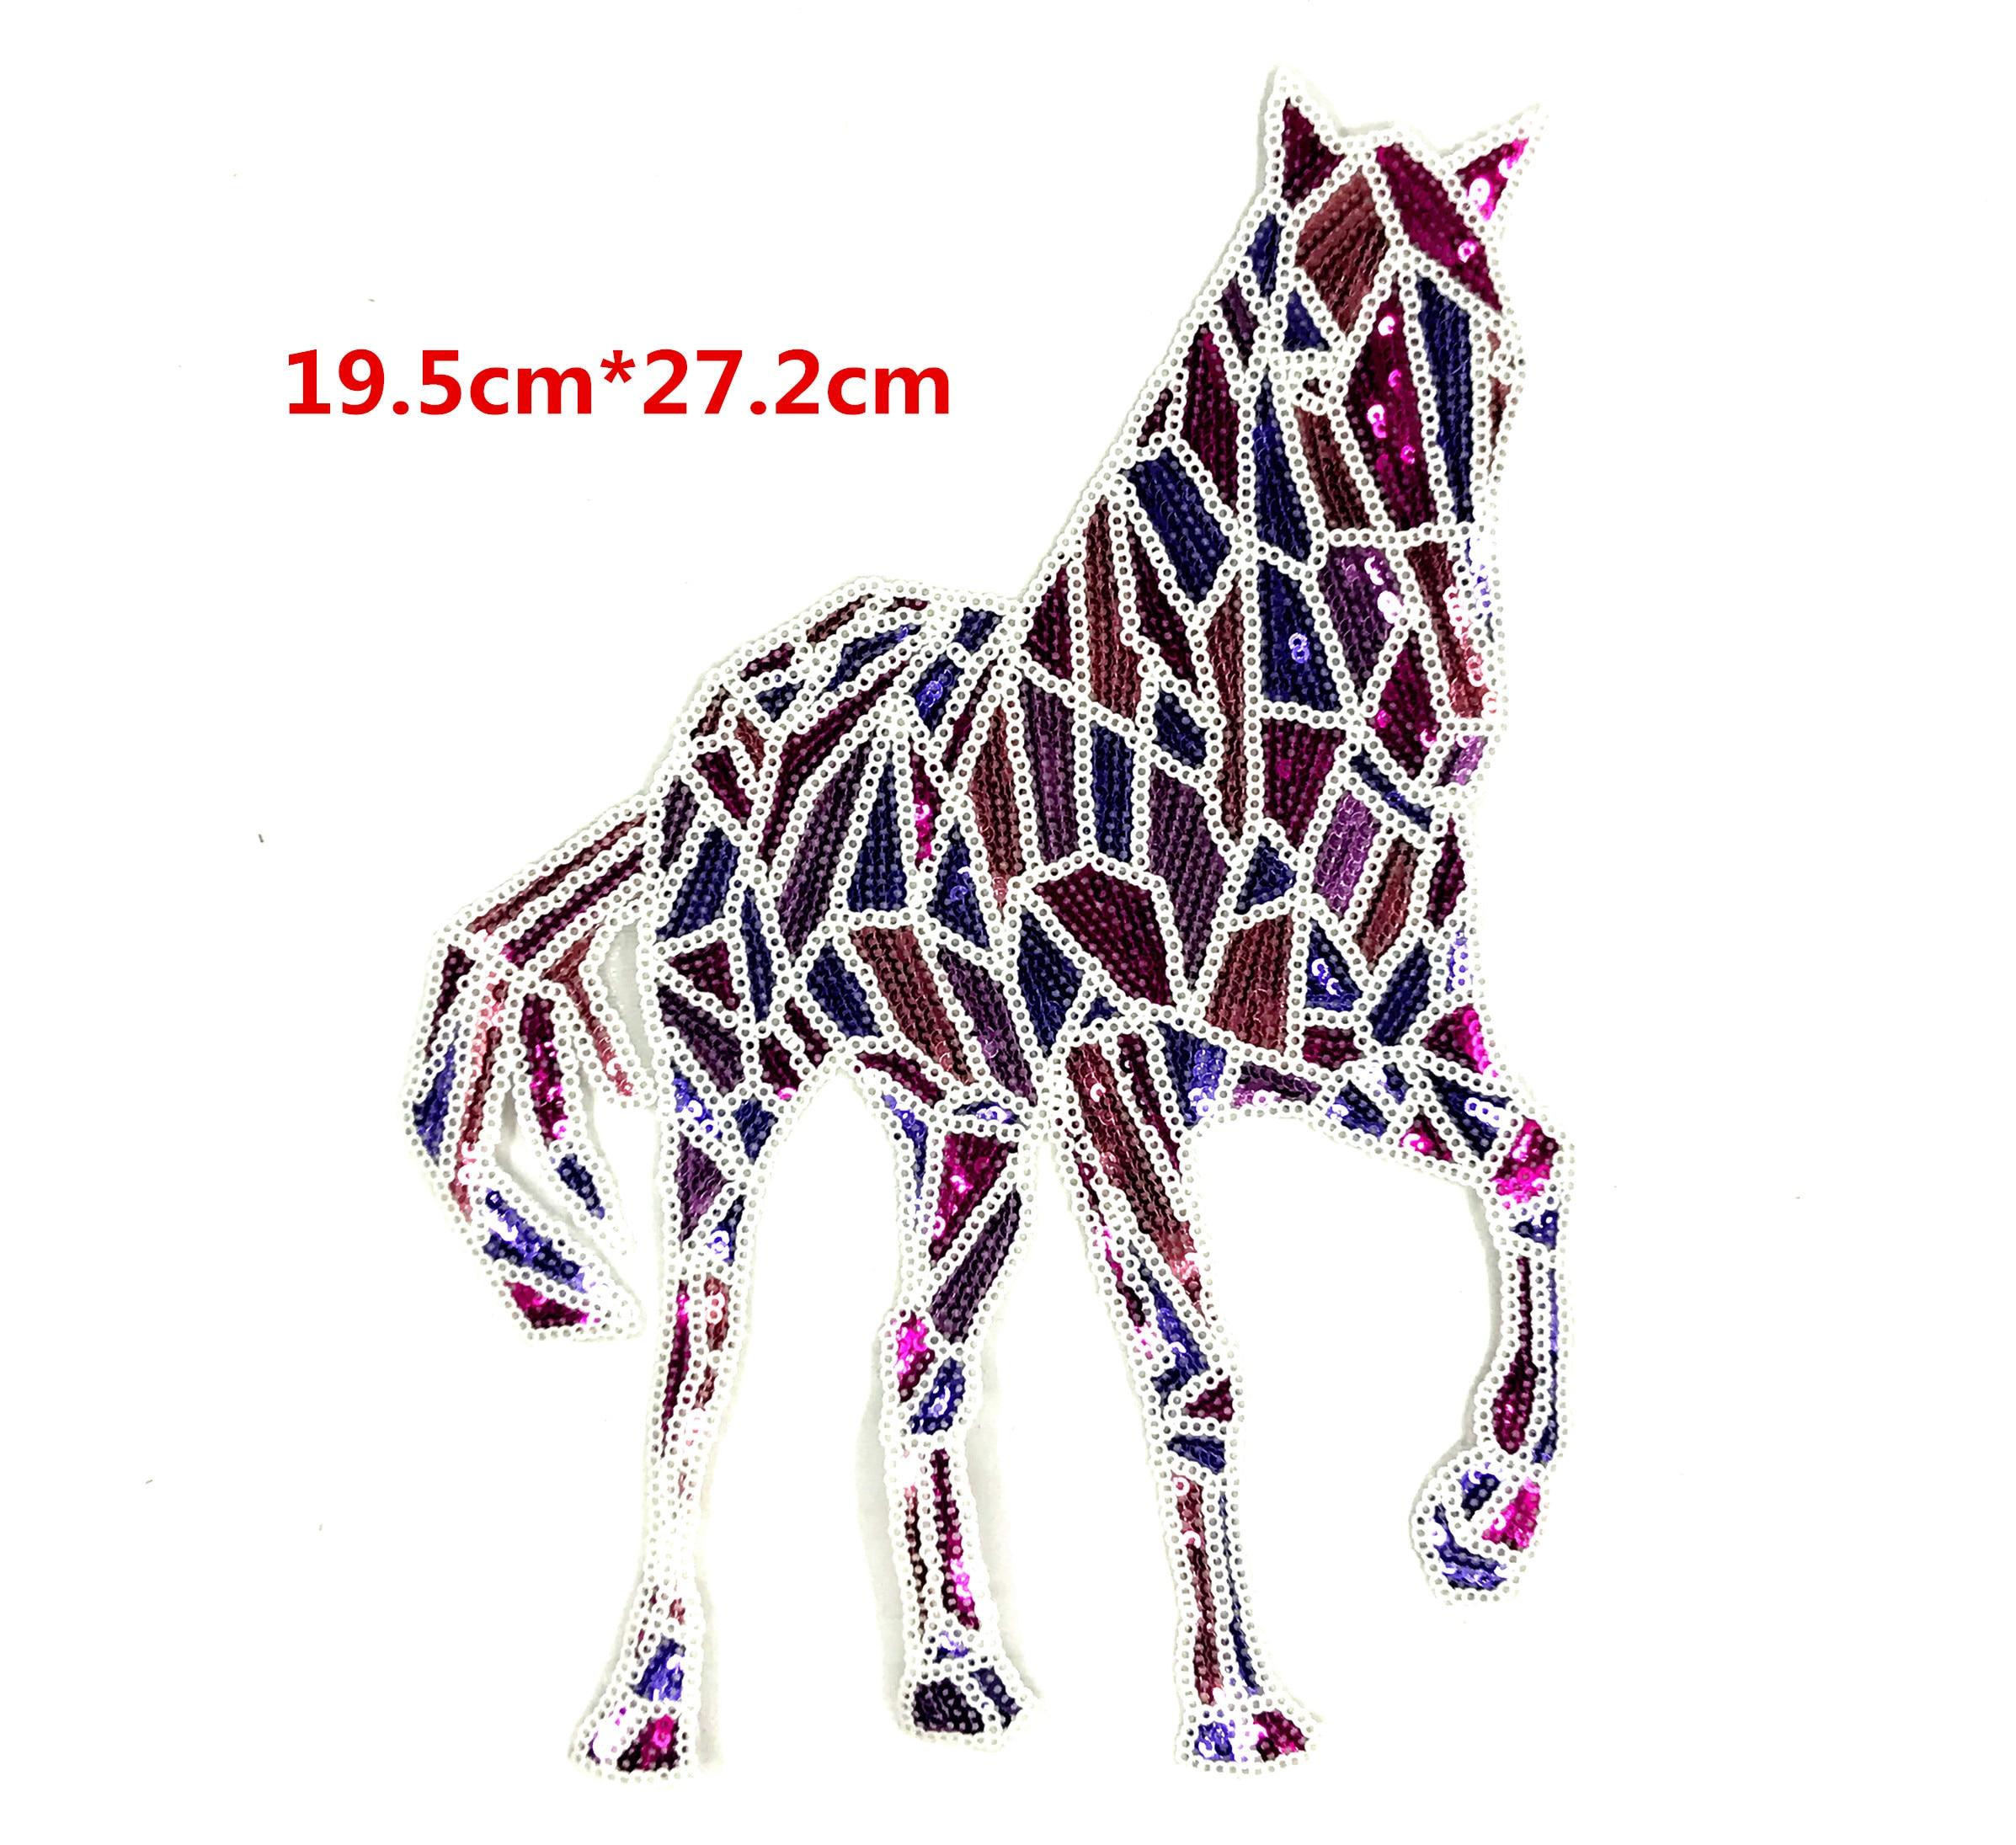 Geometría de colores caballo bordado encaje apliques de lentejuelas tela suéter parche para ropa pegatinas con lentejuelas camiseta diy decoratio